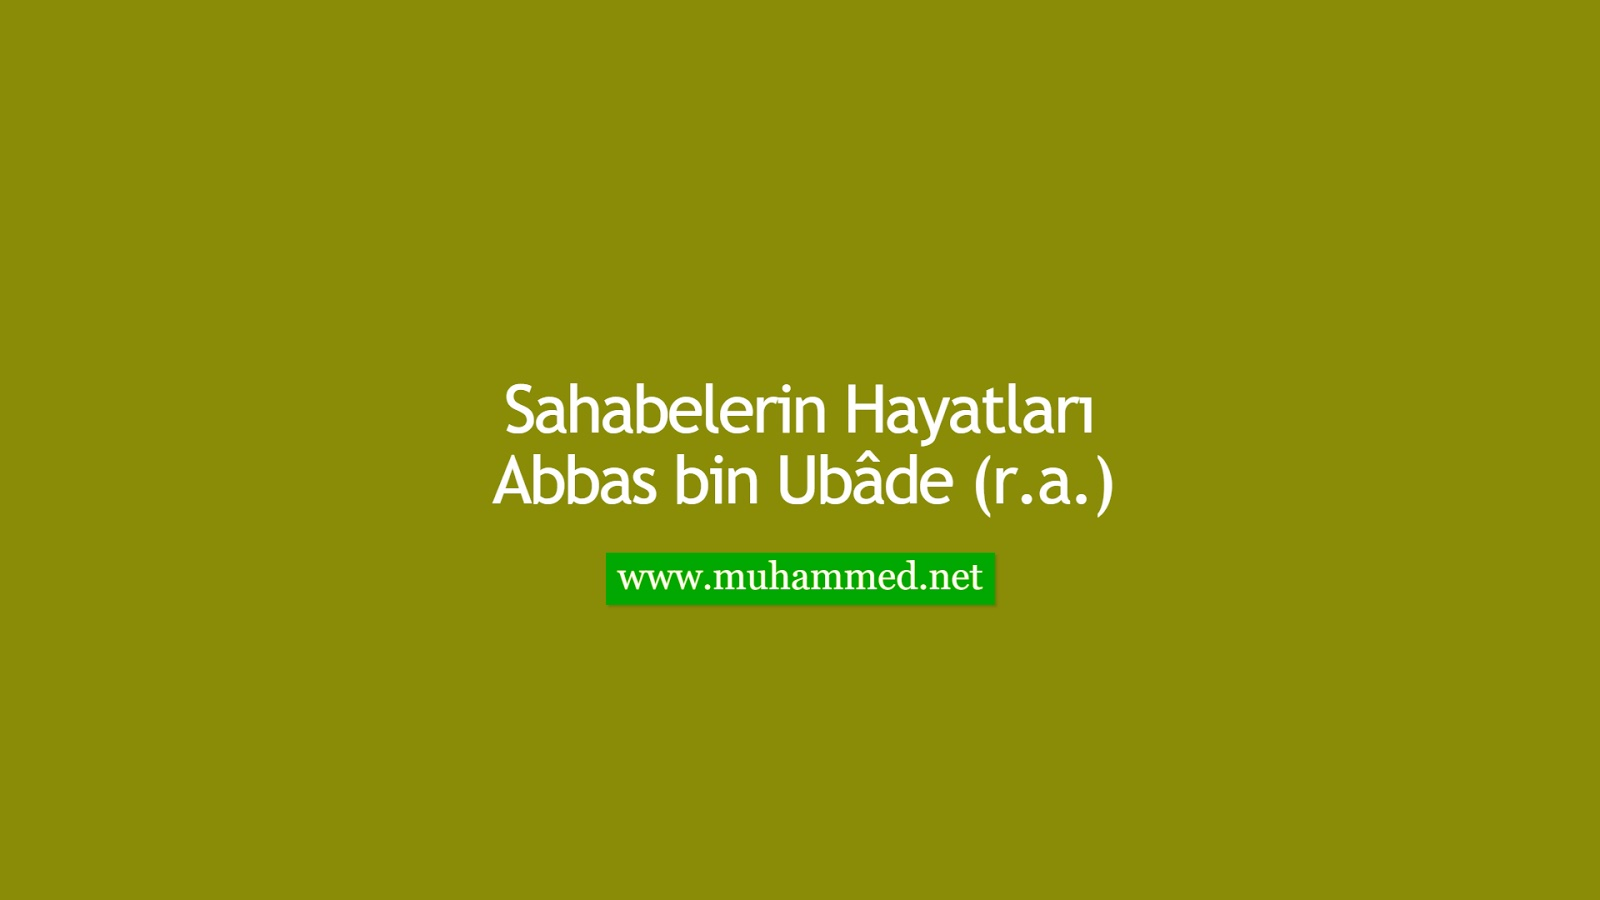 Abbas bin Ubâde (r.a.)